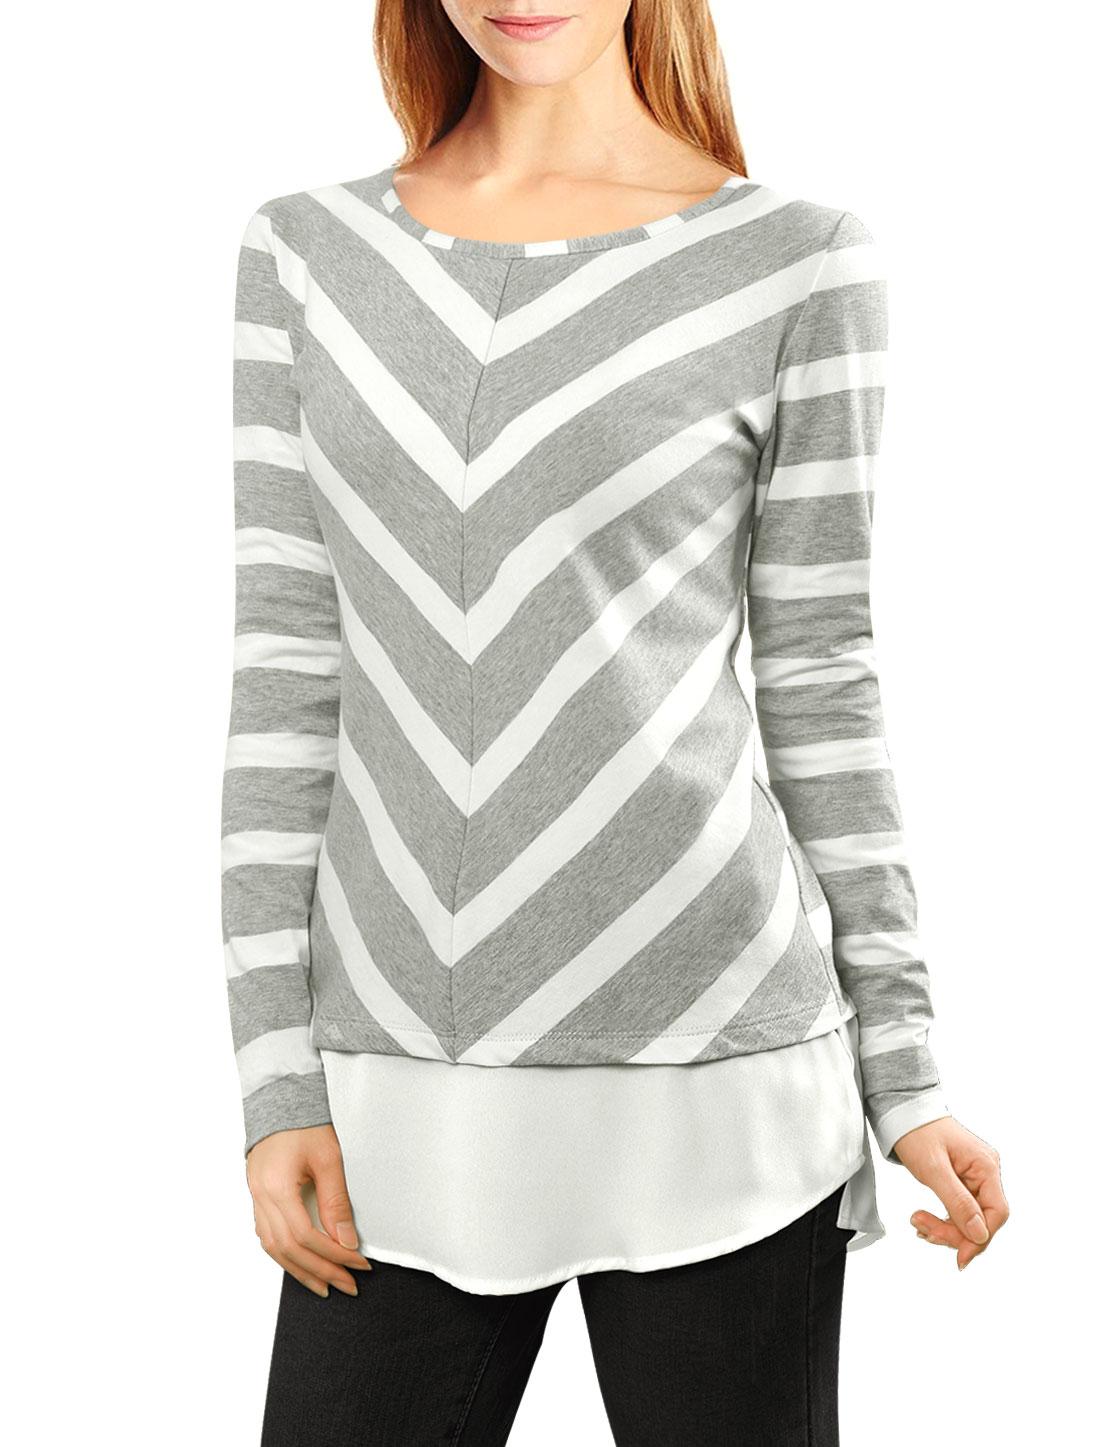 Allegra K Women Layered Tunic Top in Striped and Chevron Print Gray L